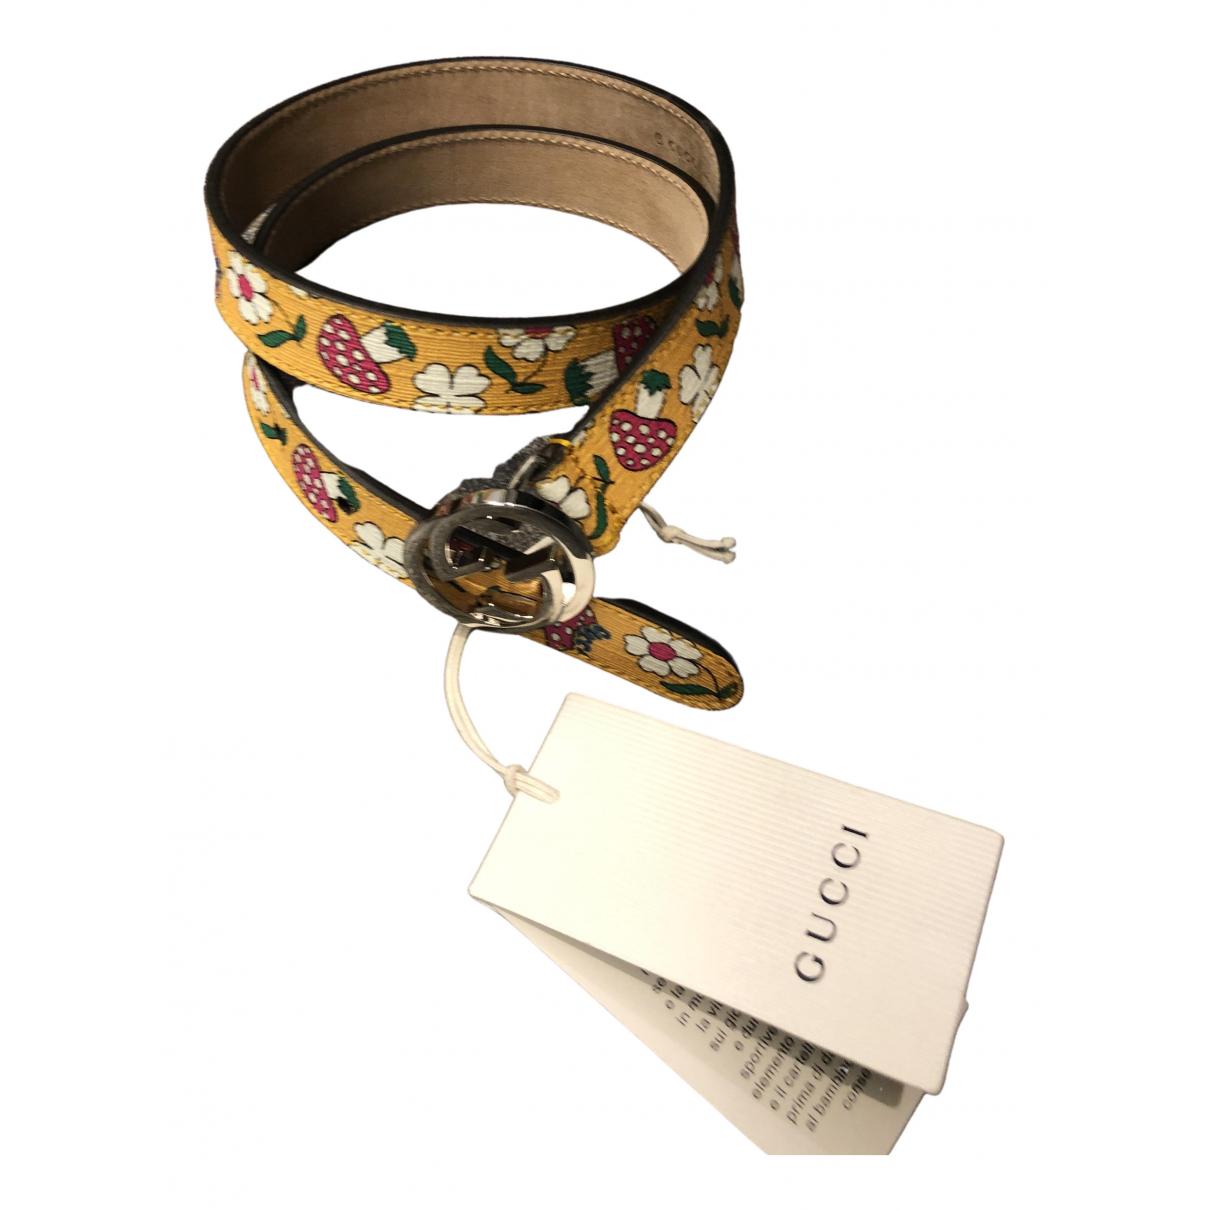 Gucci \N Multicolour Cloth belt.Suspenders for Kids \N